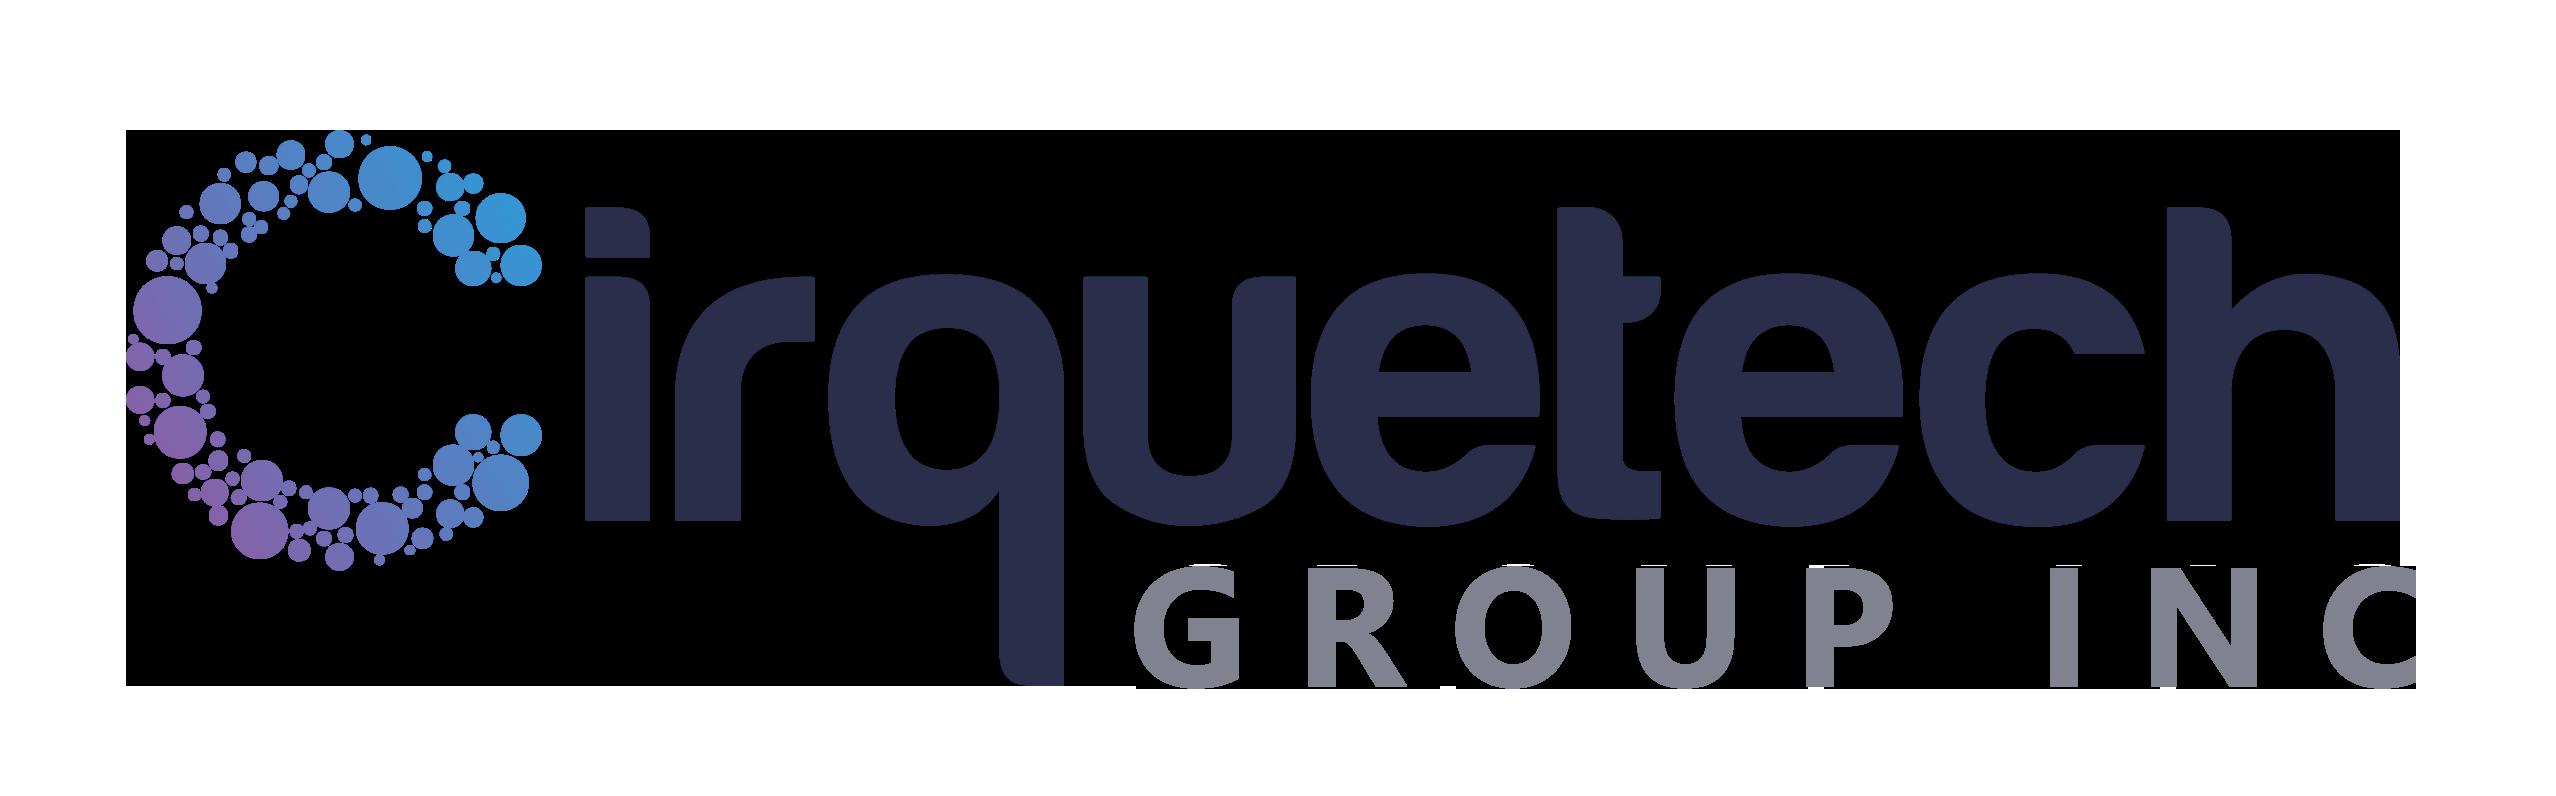 CirquetechGroup Logo